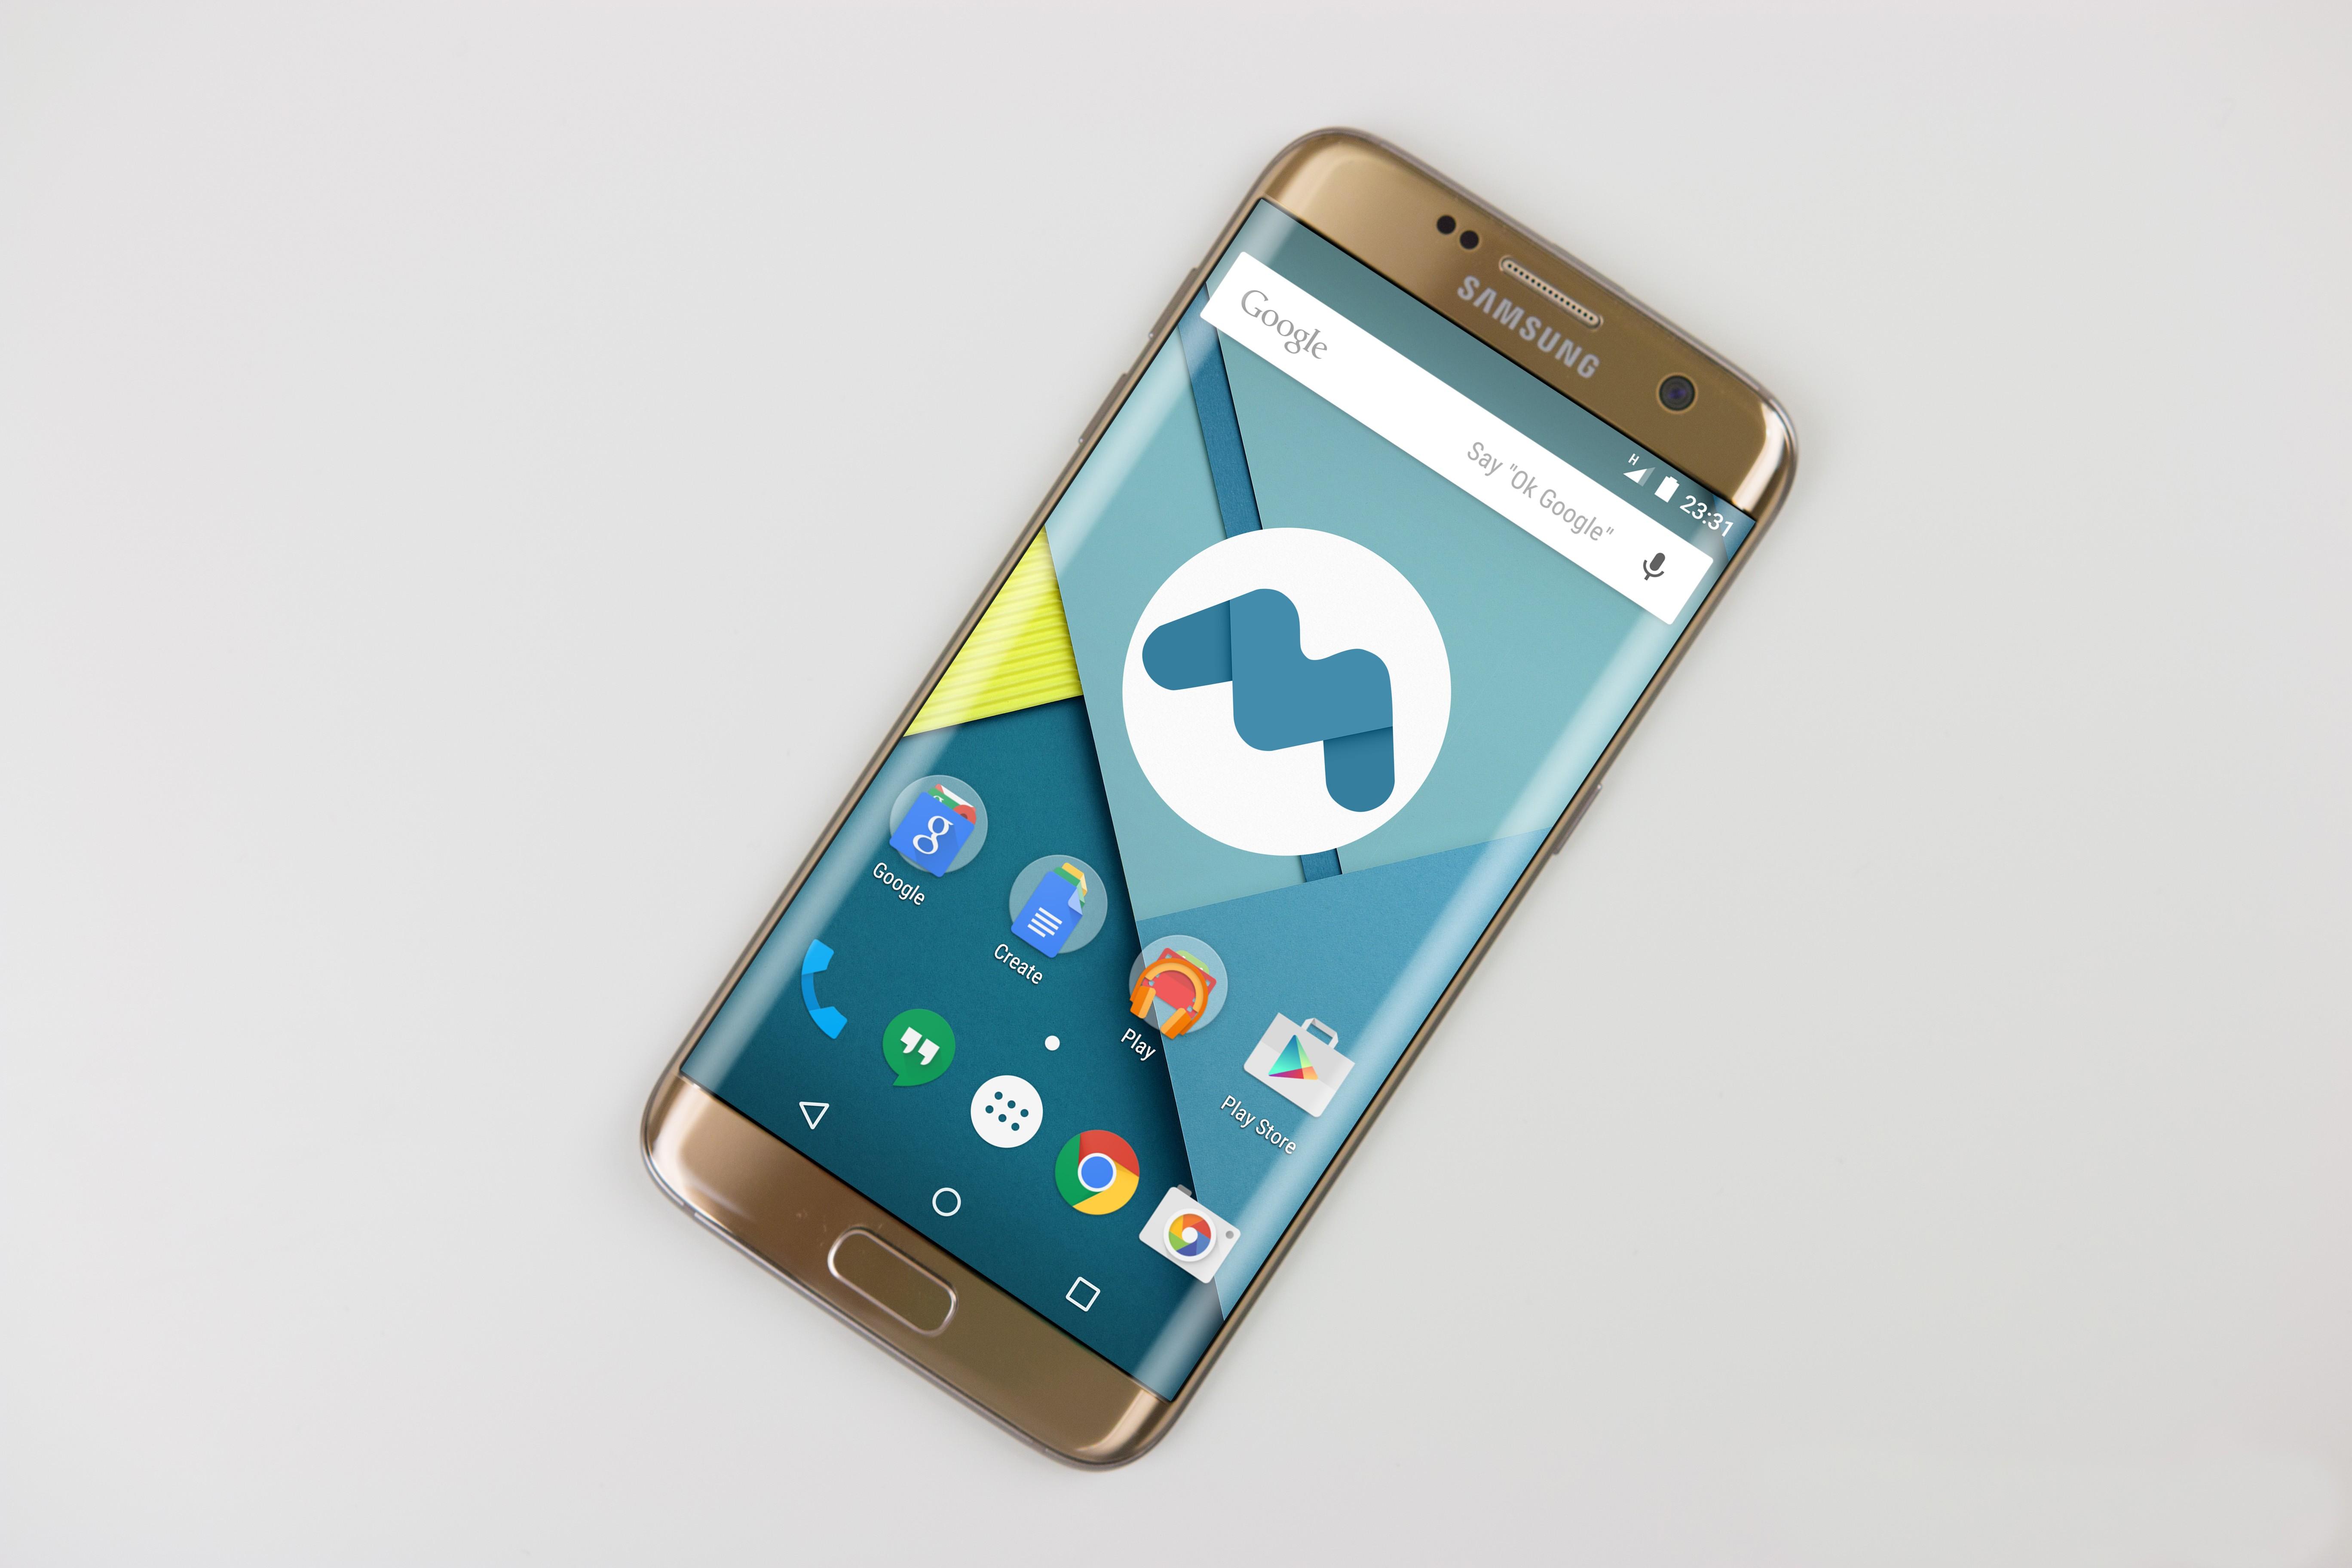 Samsung-Galaxy-S7-Edge-Mockup-Vol.1-Mockup-Catalog